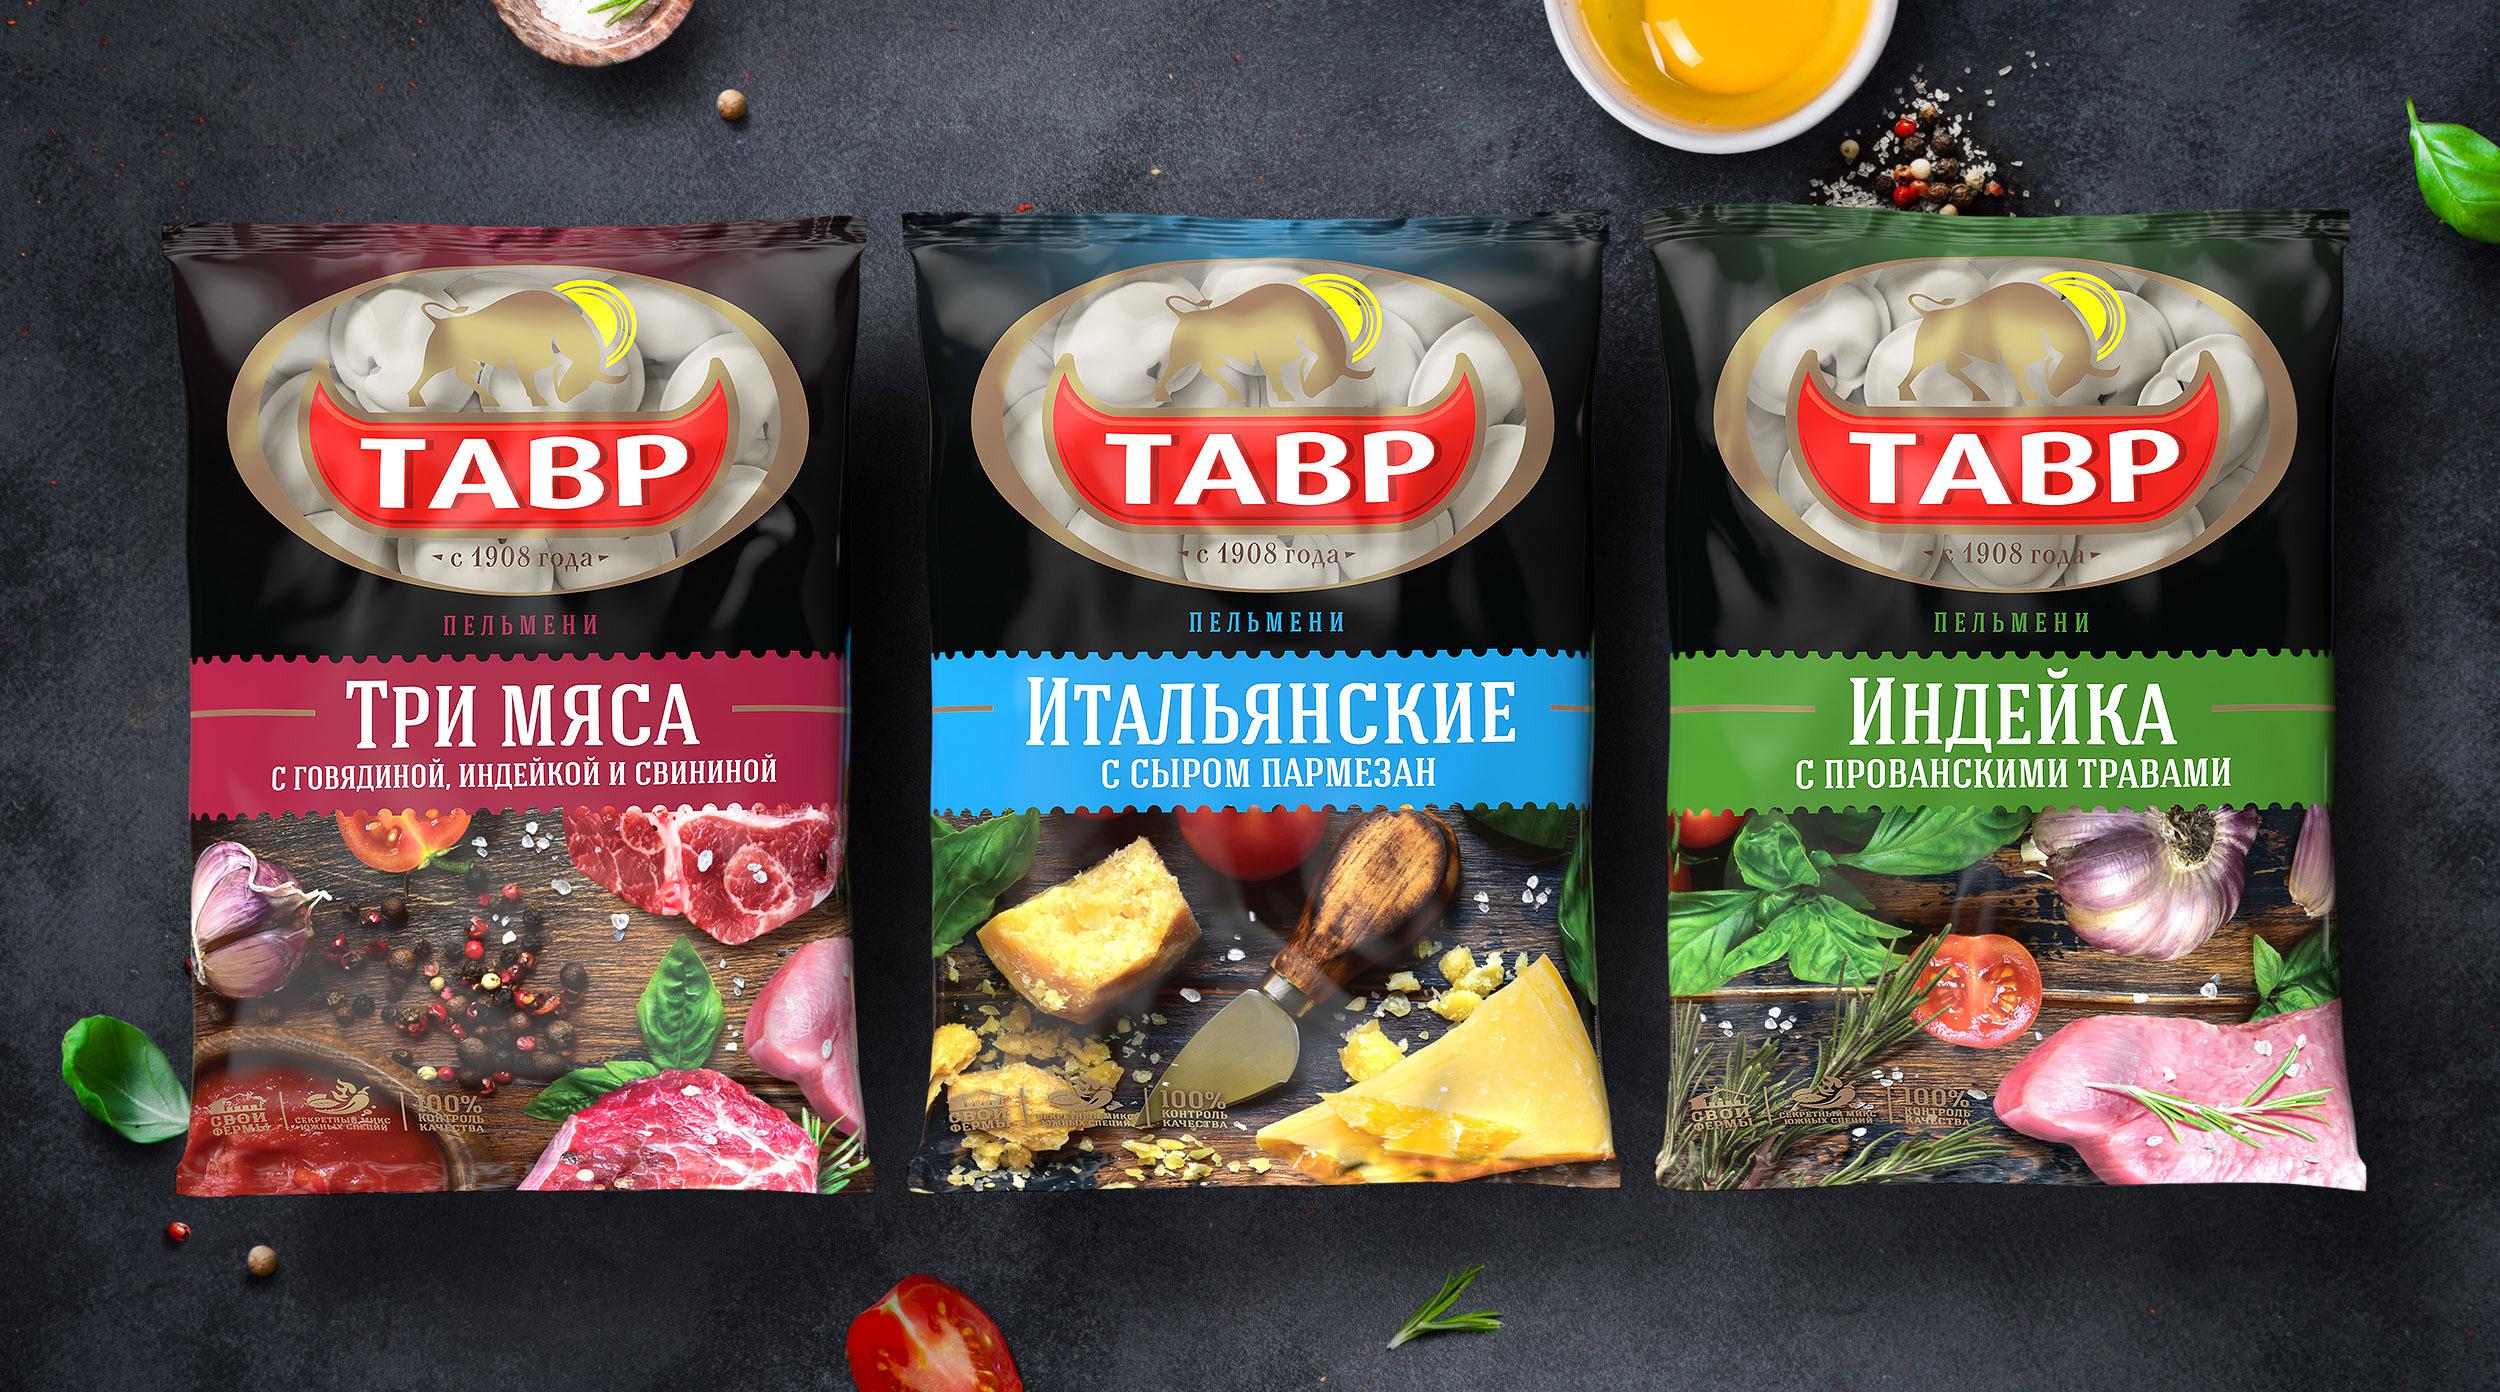 CUBA Creative Branding Studio Create Tavr Dumplings Packaging Design